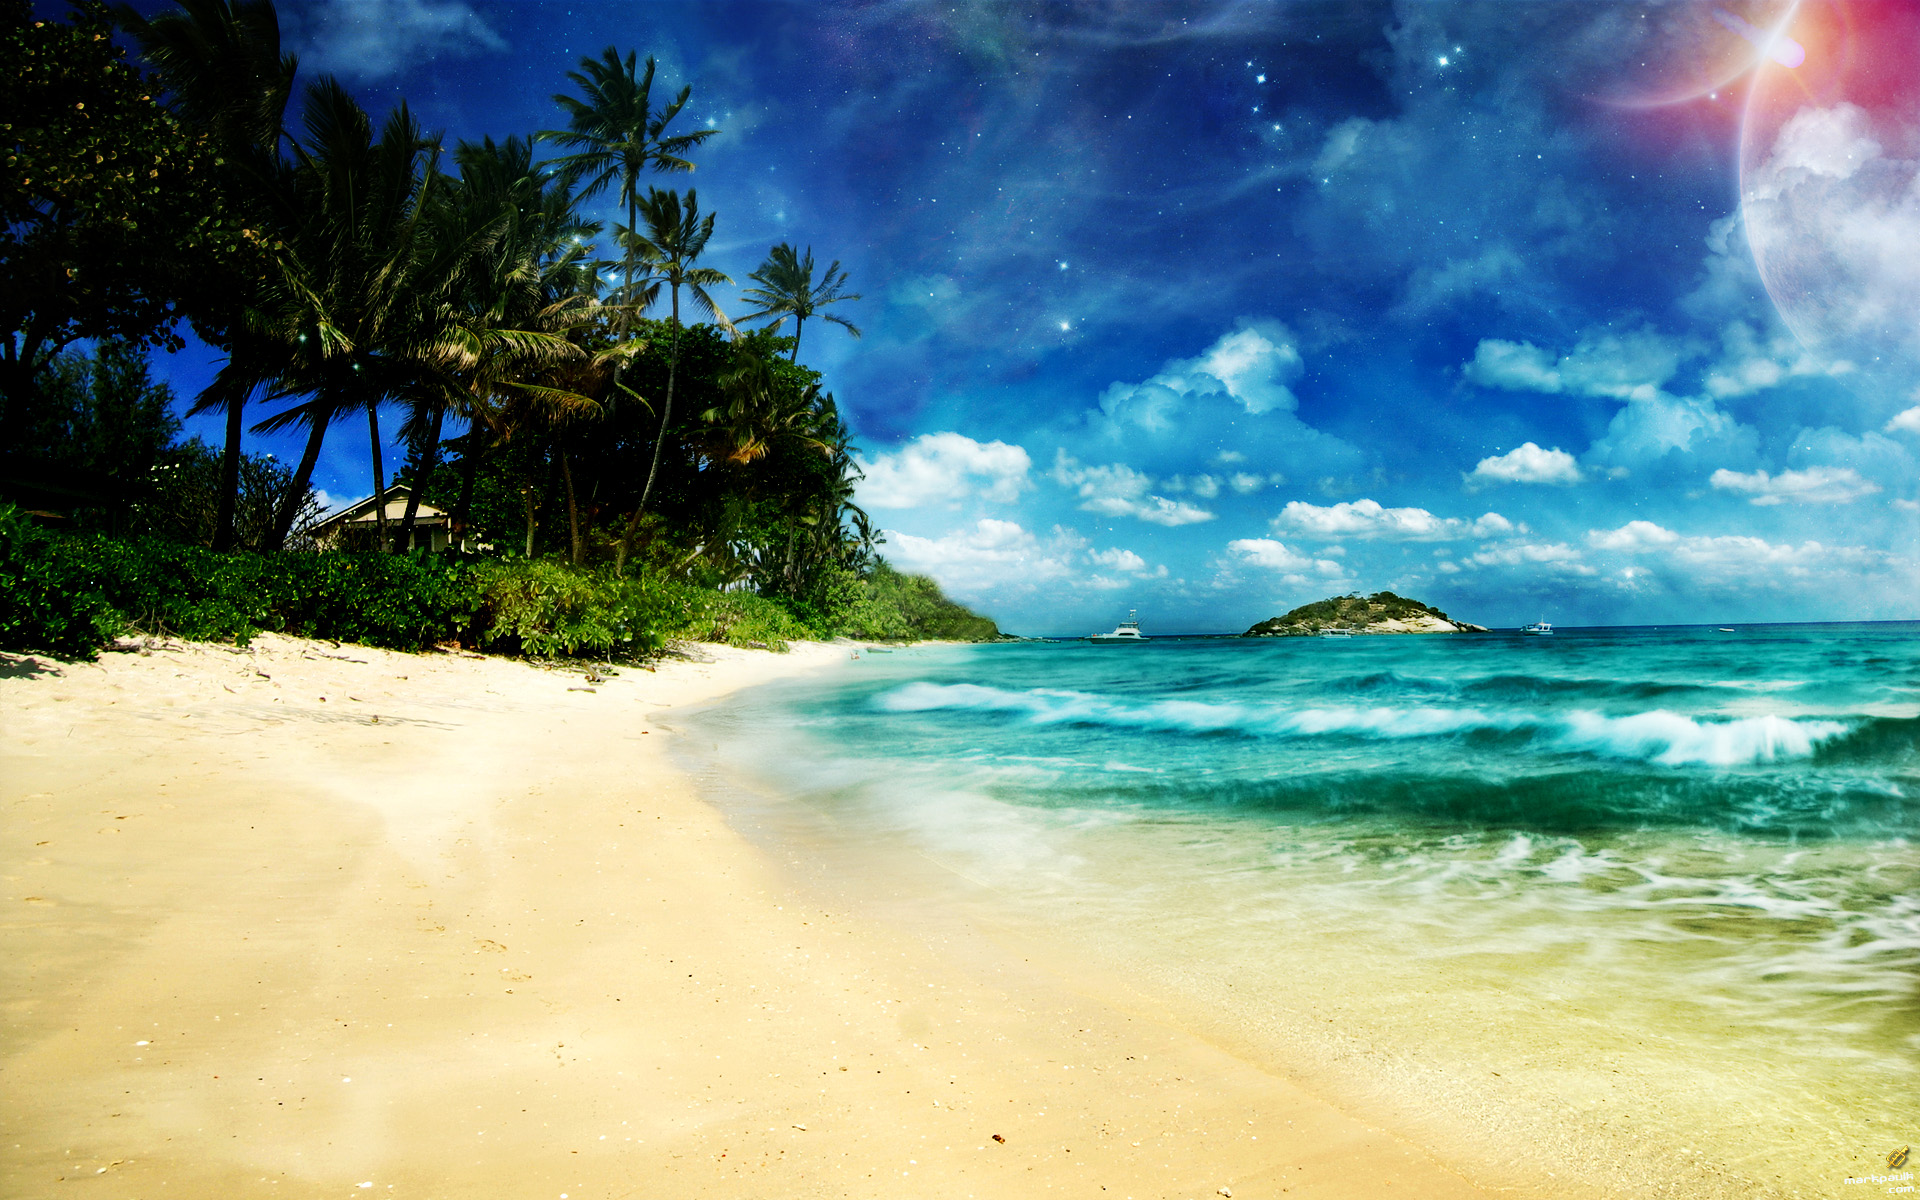 Tierra/Naturaleza - Playa  Océano Fondo de Pantalla